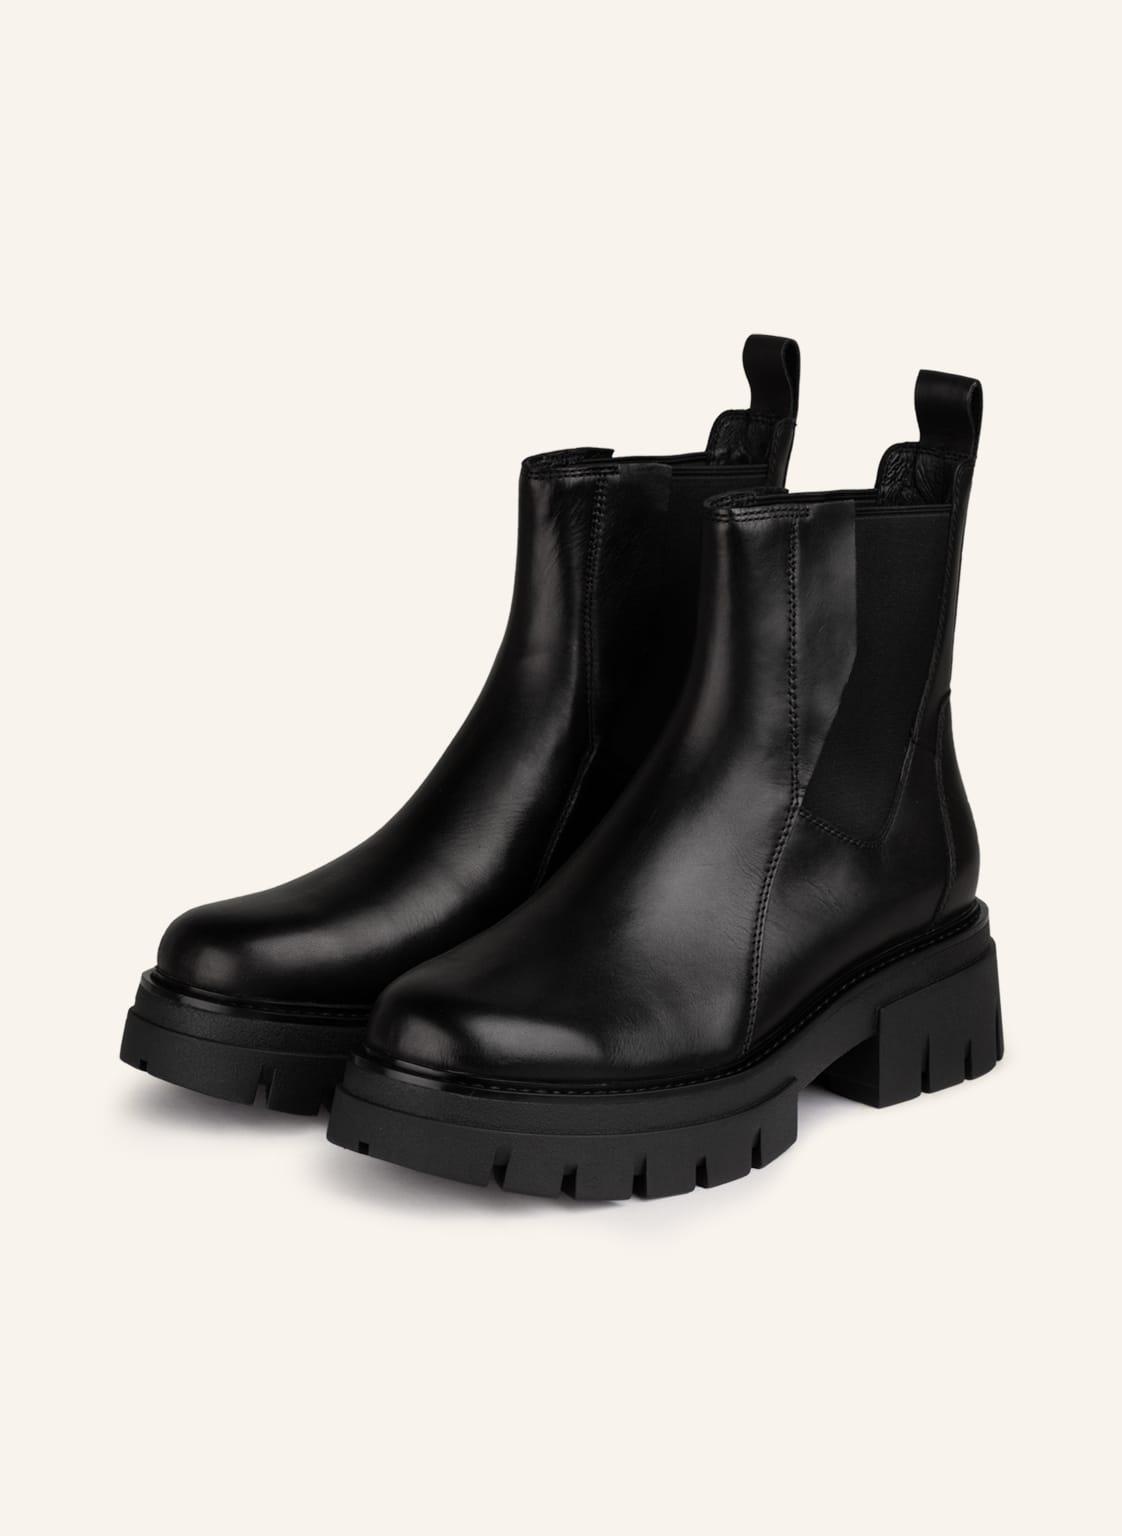 Image of Ash Chelsea-Boots Links schwarz